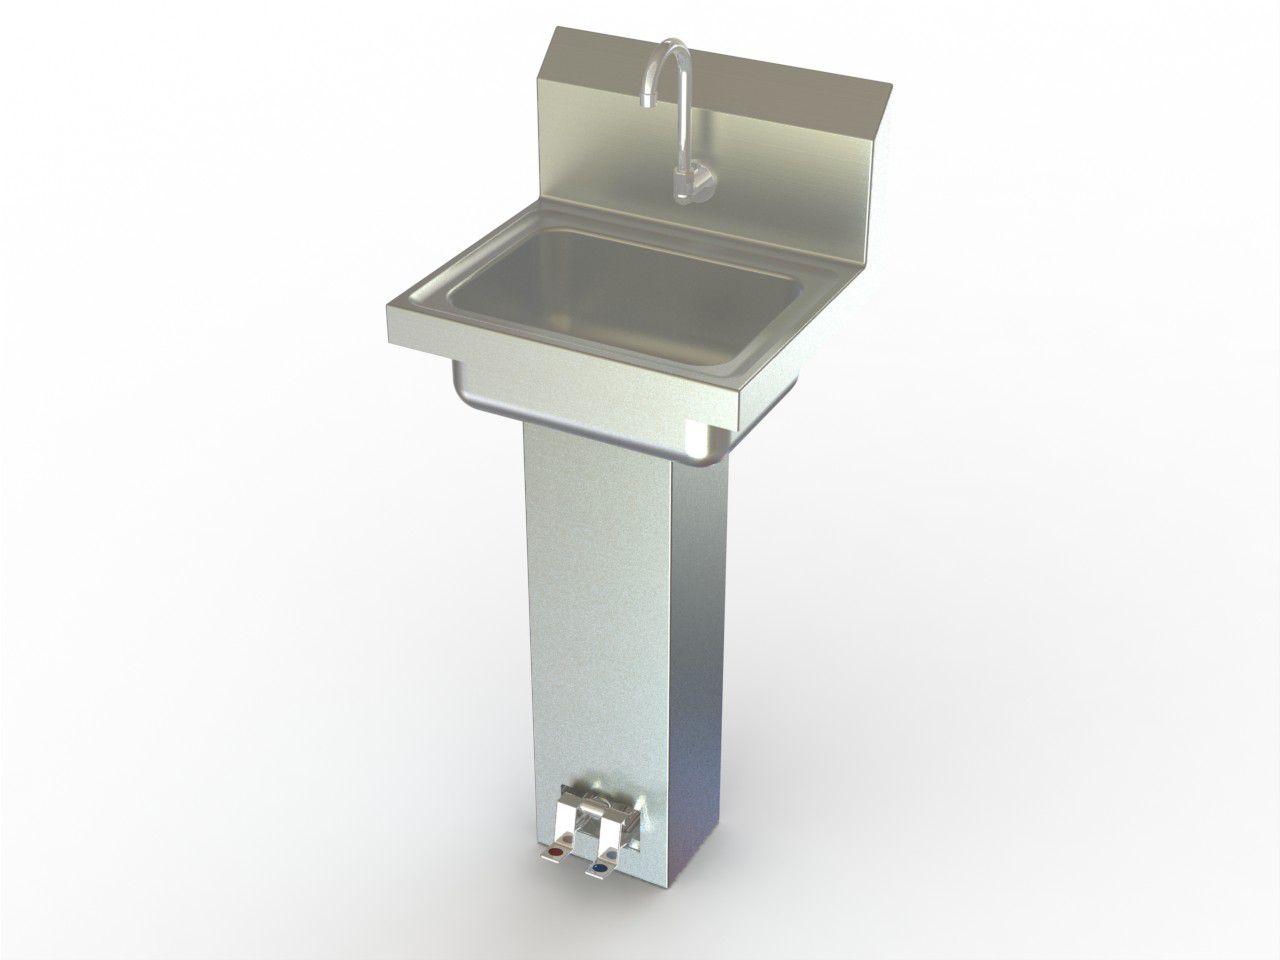 Aero Manufacturing Hand Sink - Pedestal Base, Foot Pedals, Ss, Each ...